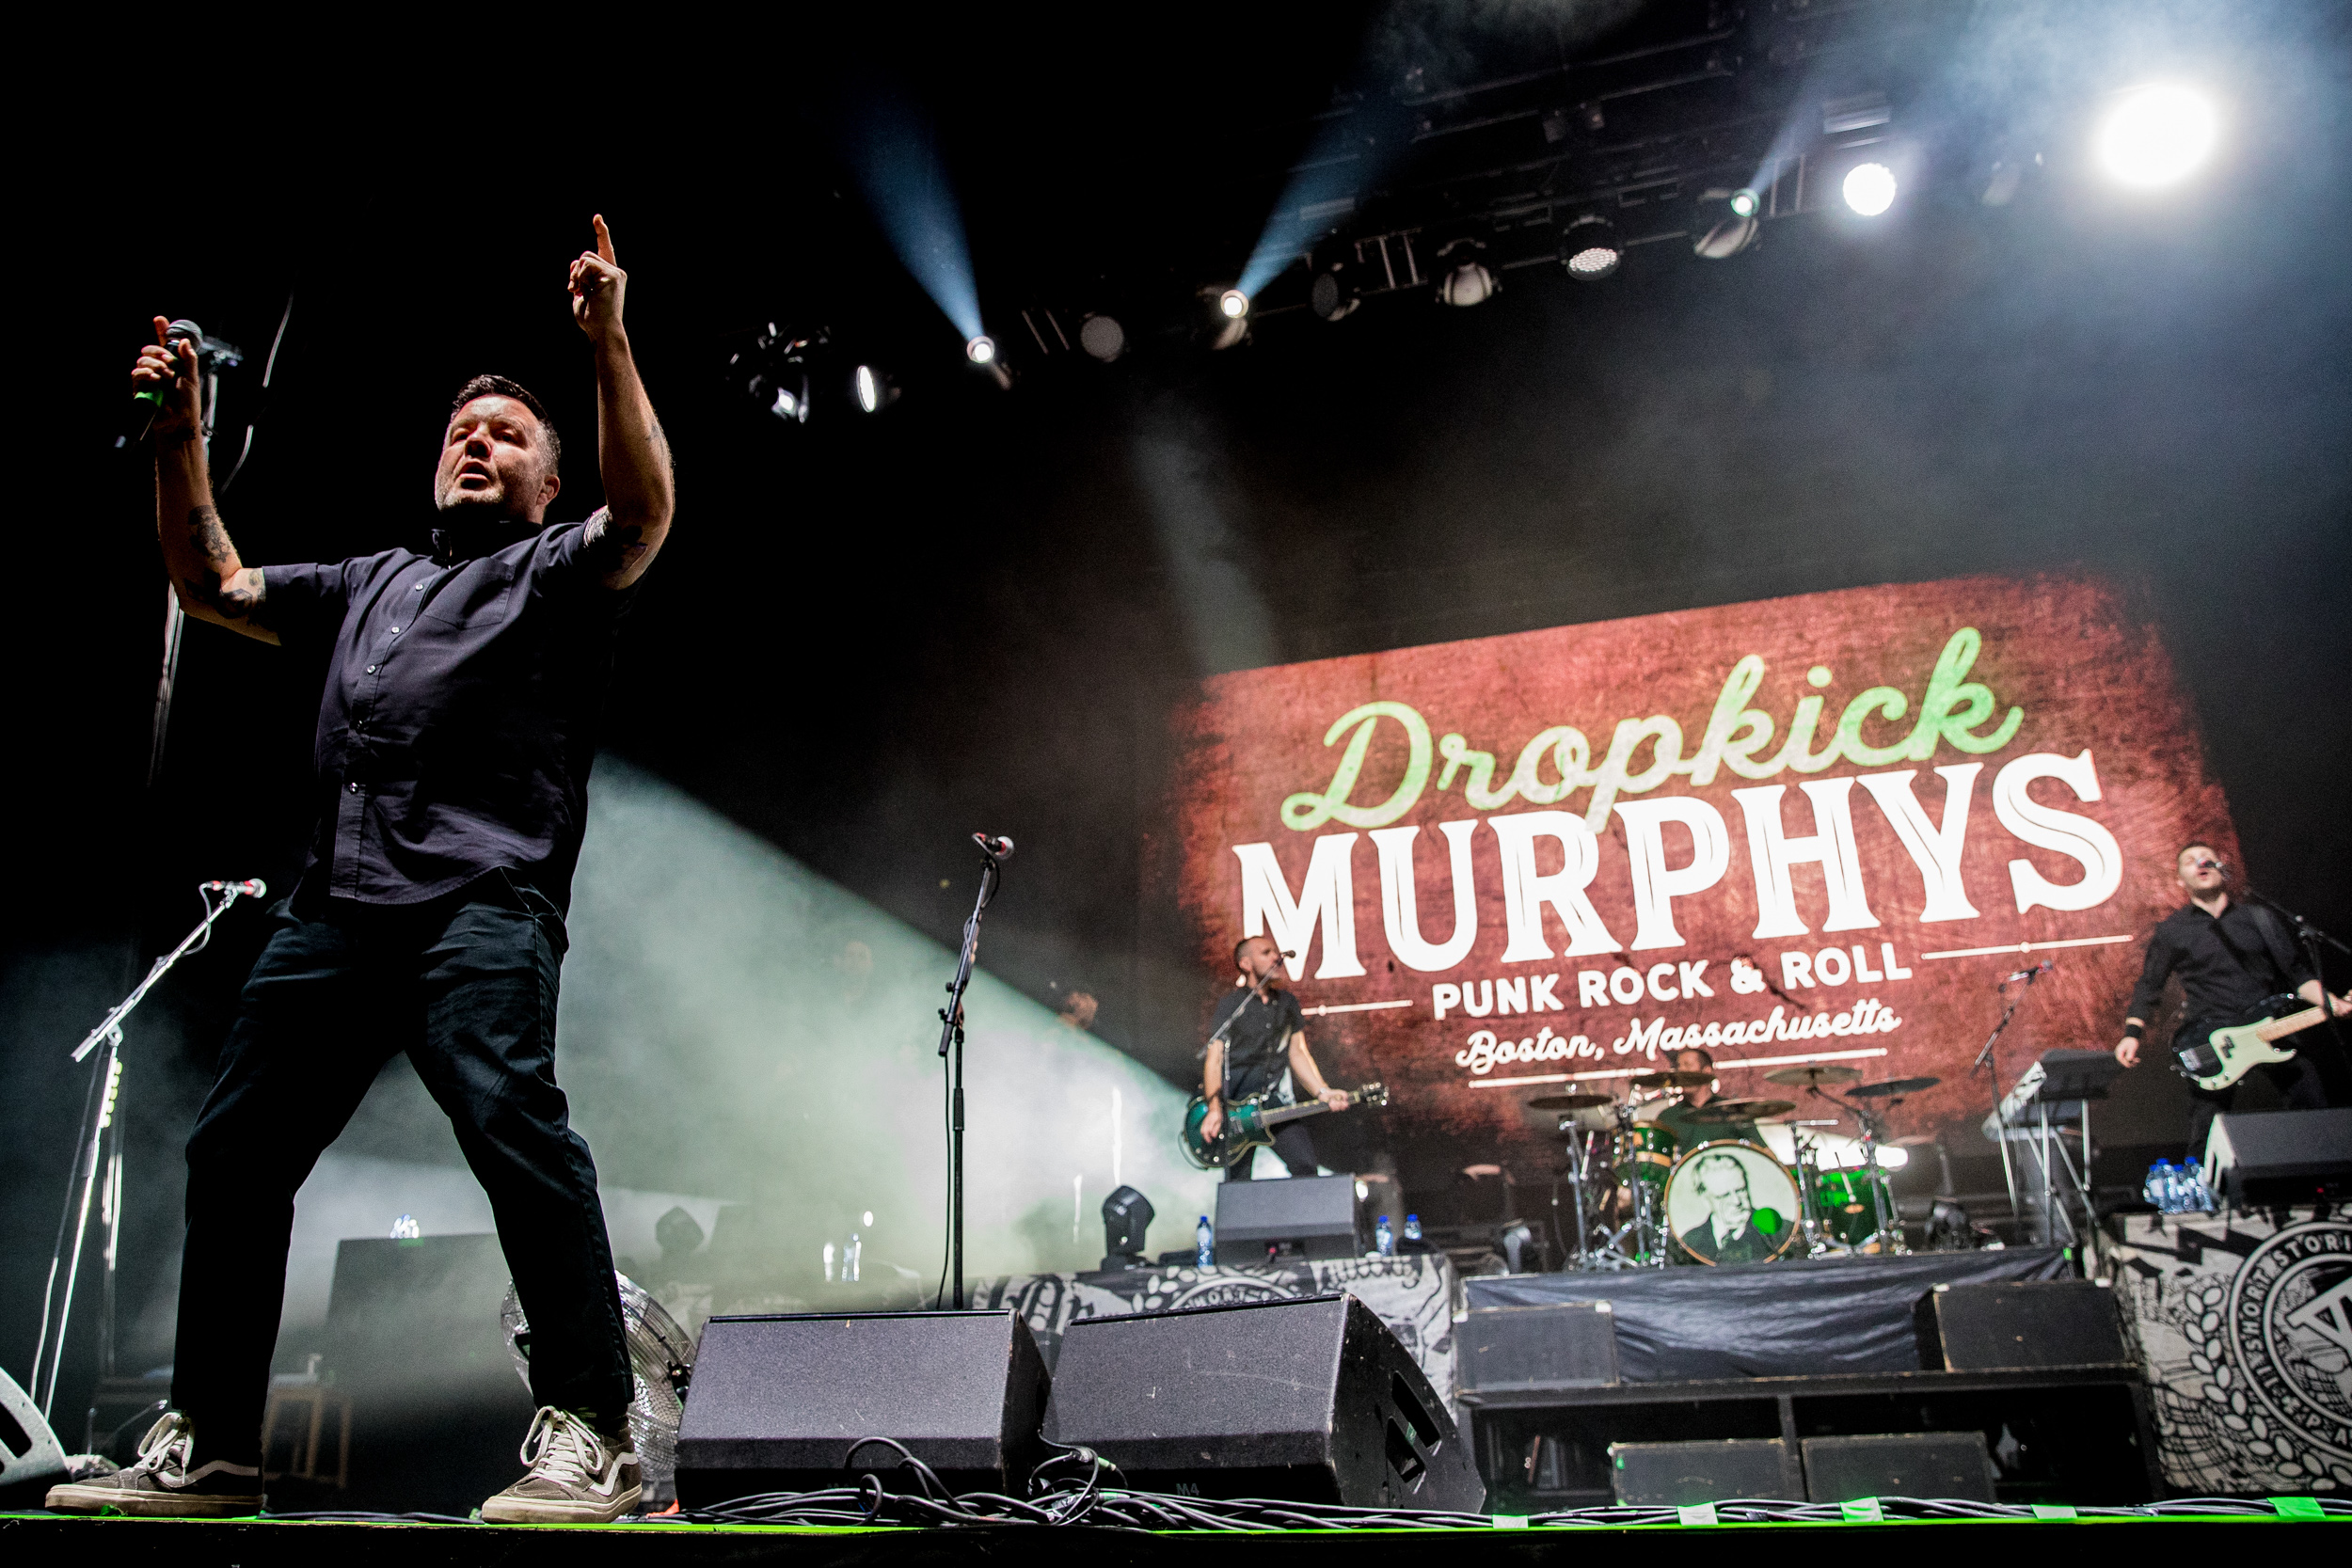 bruce-springsteen-dropkick-murphys-2